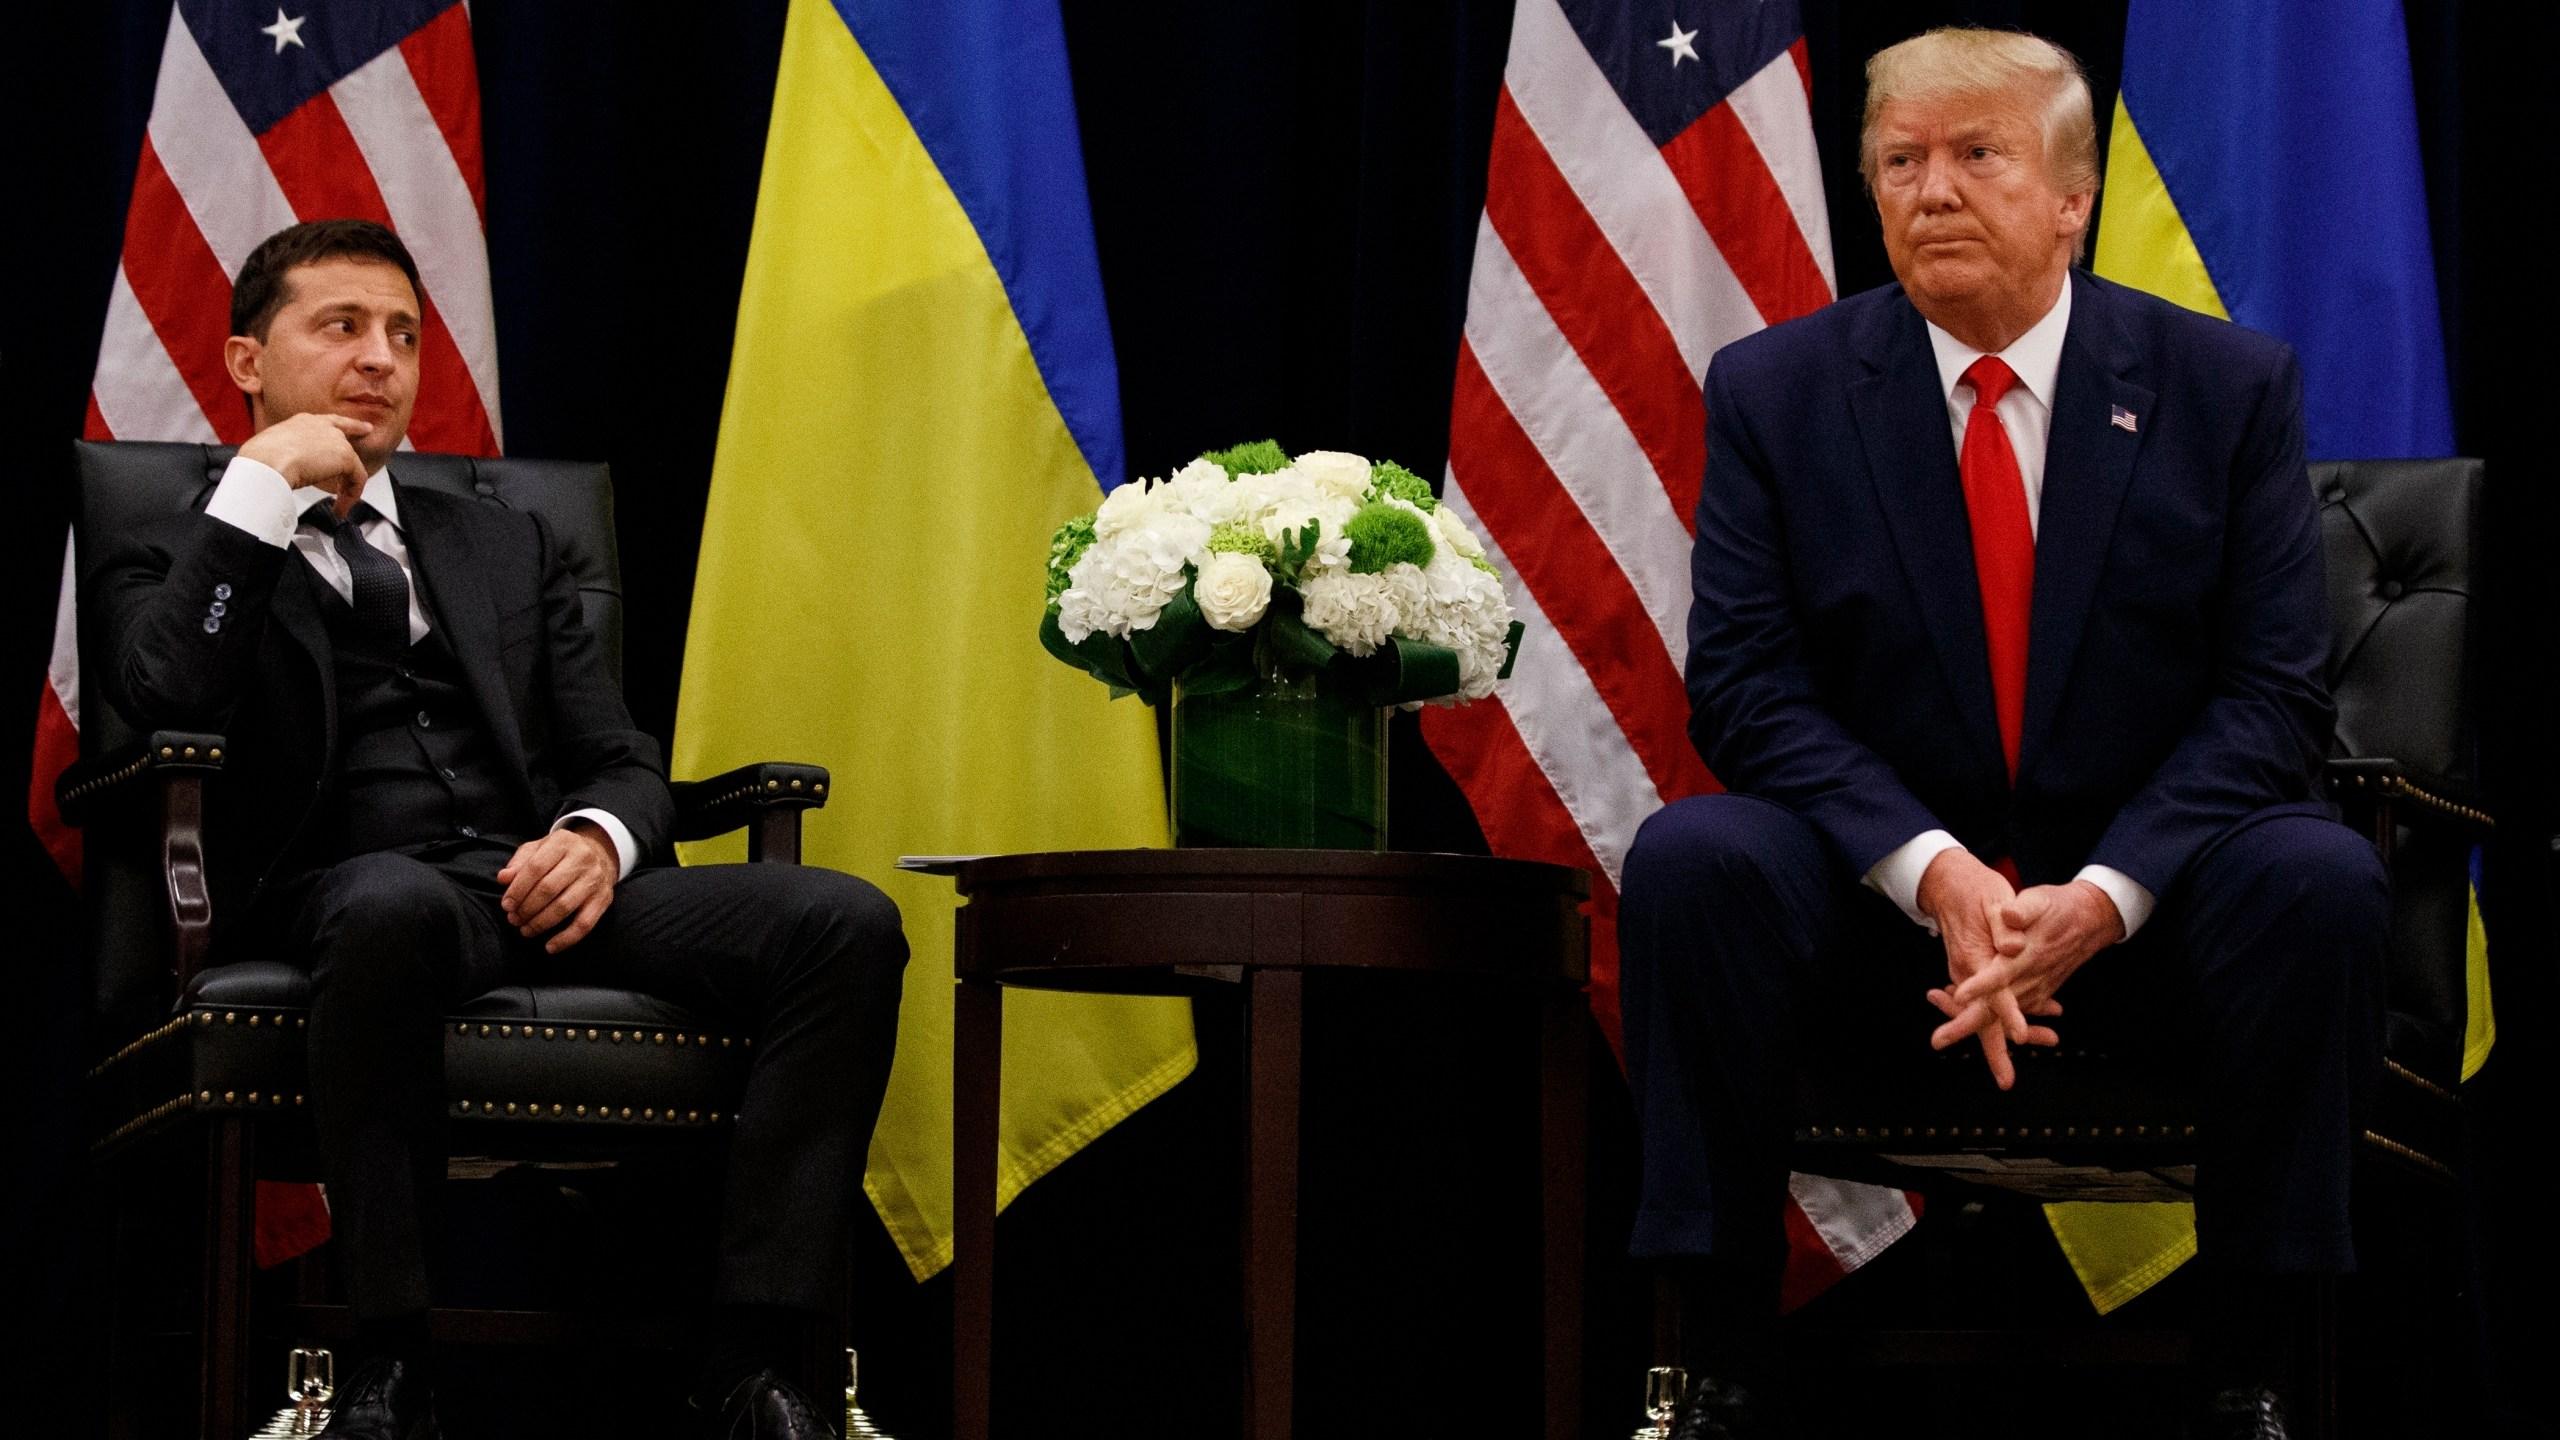 Donald Trump, Volodymyr Zelenskiy